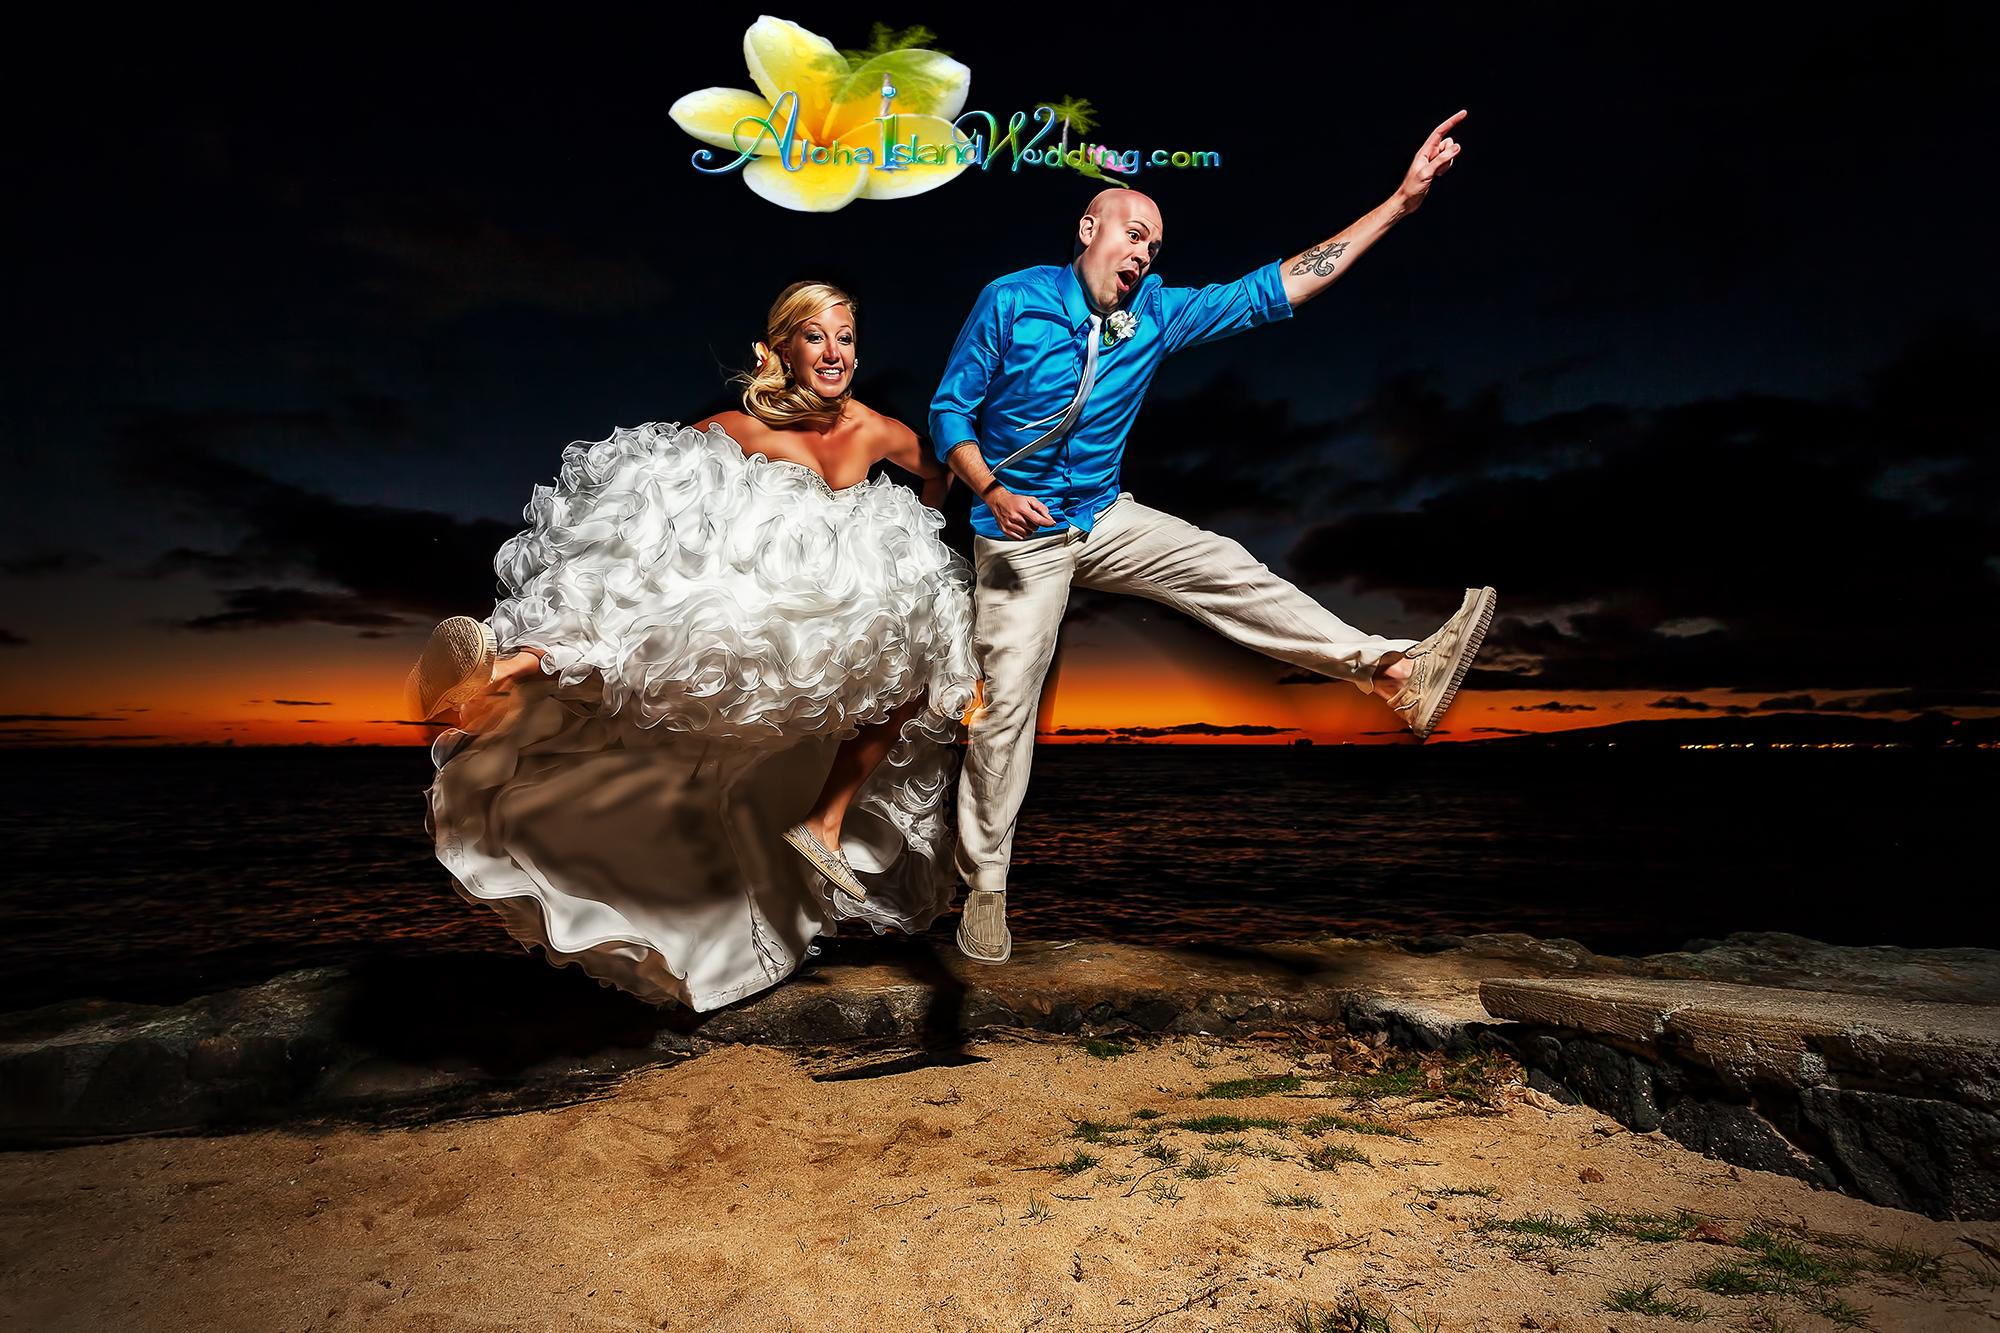 WeddinginHawaii picture - Alohaislan